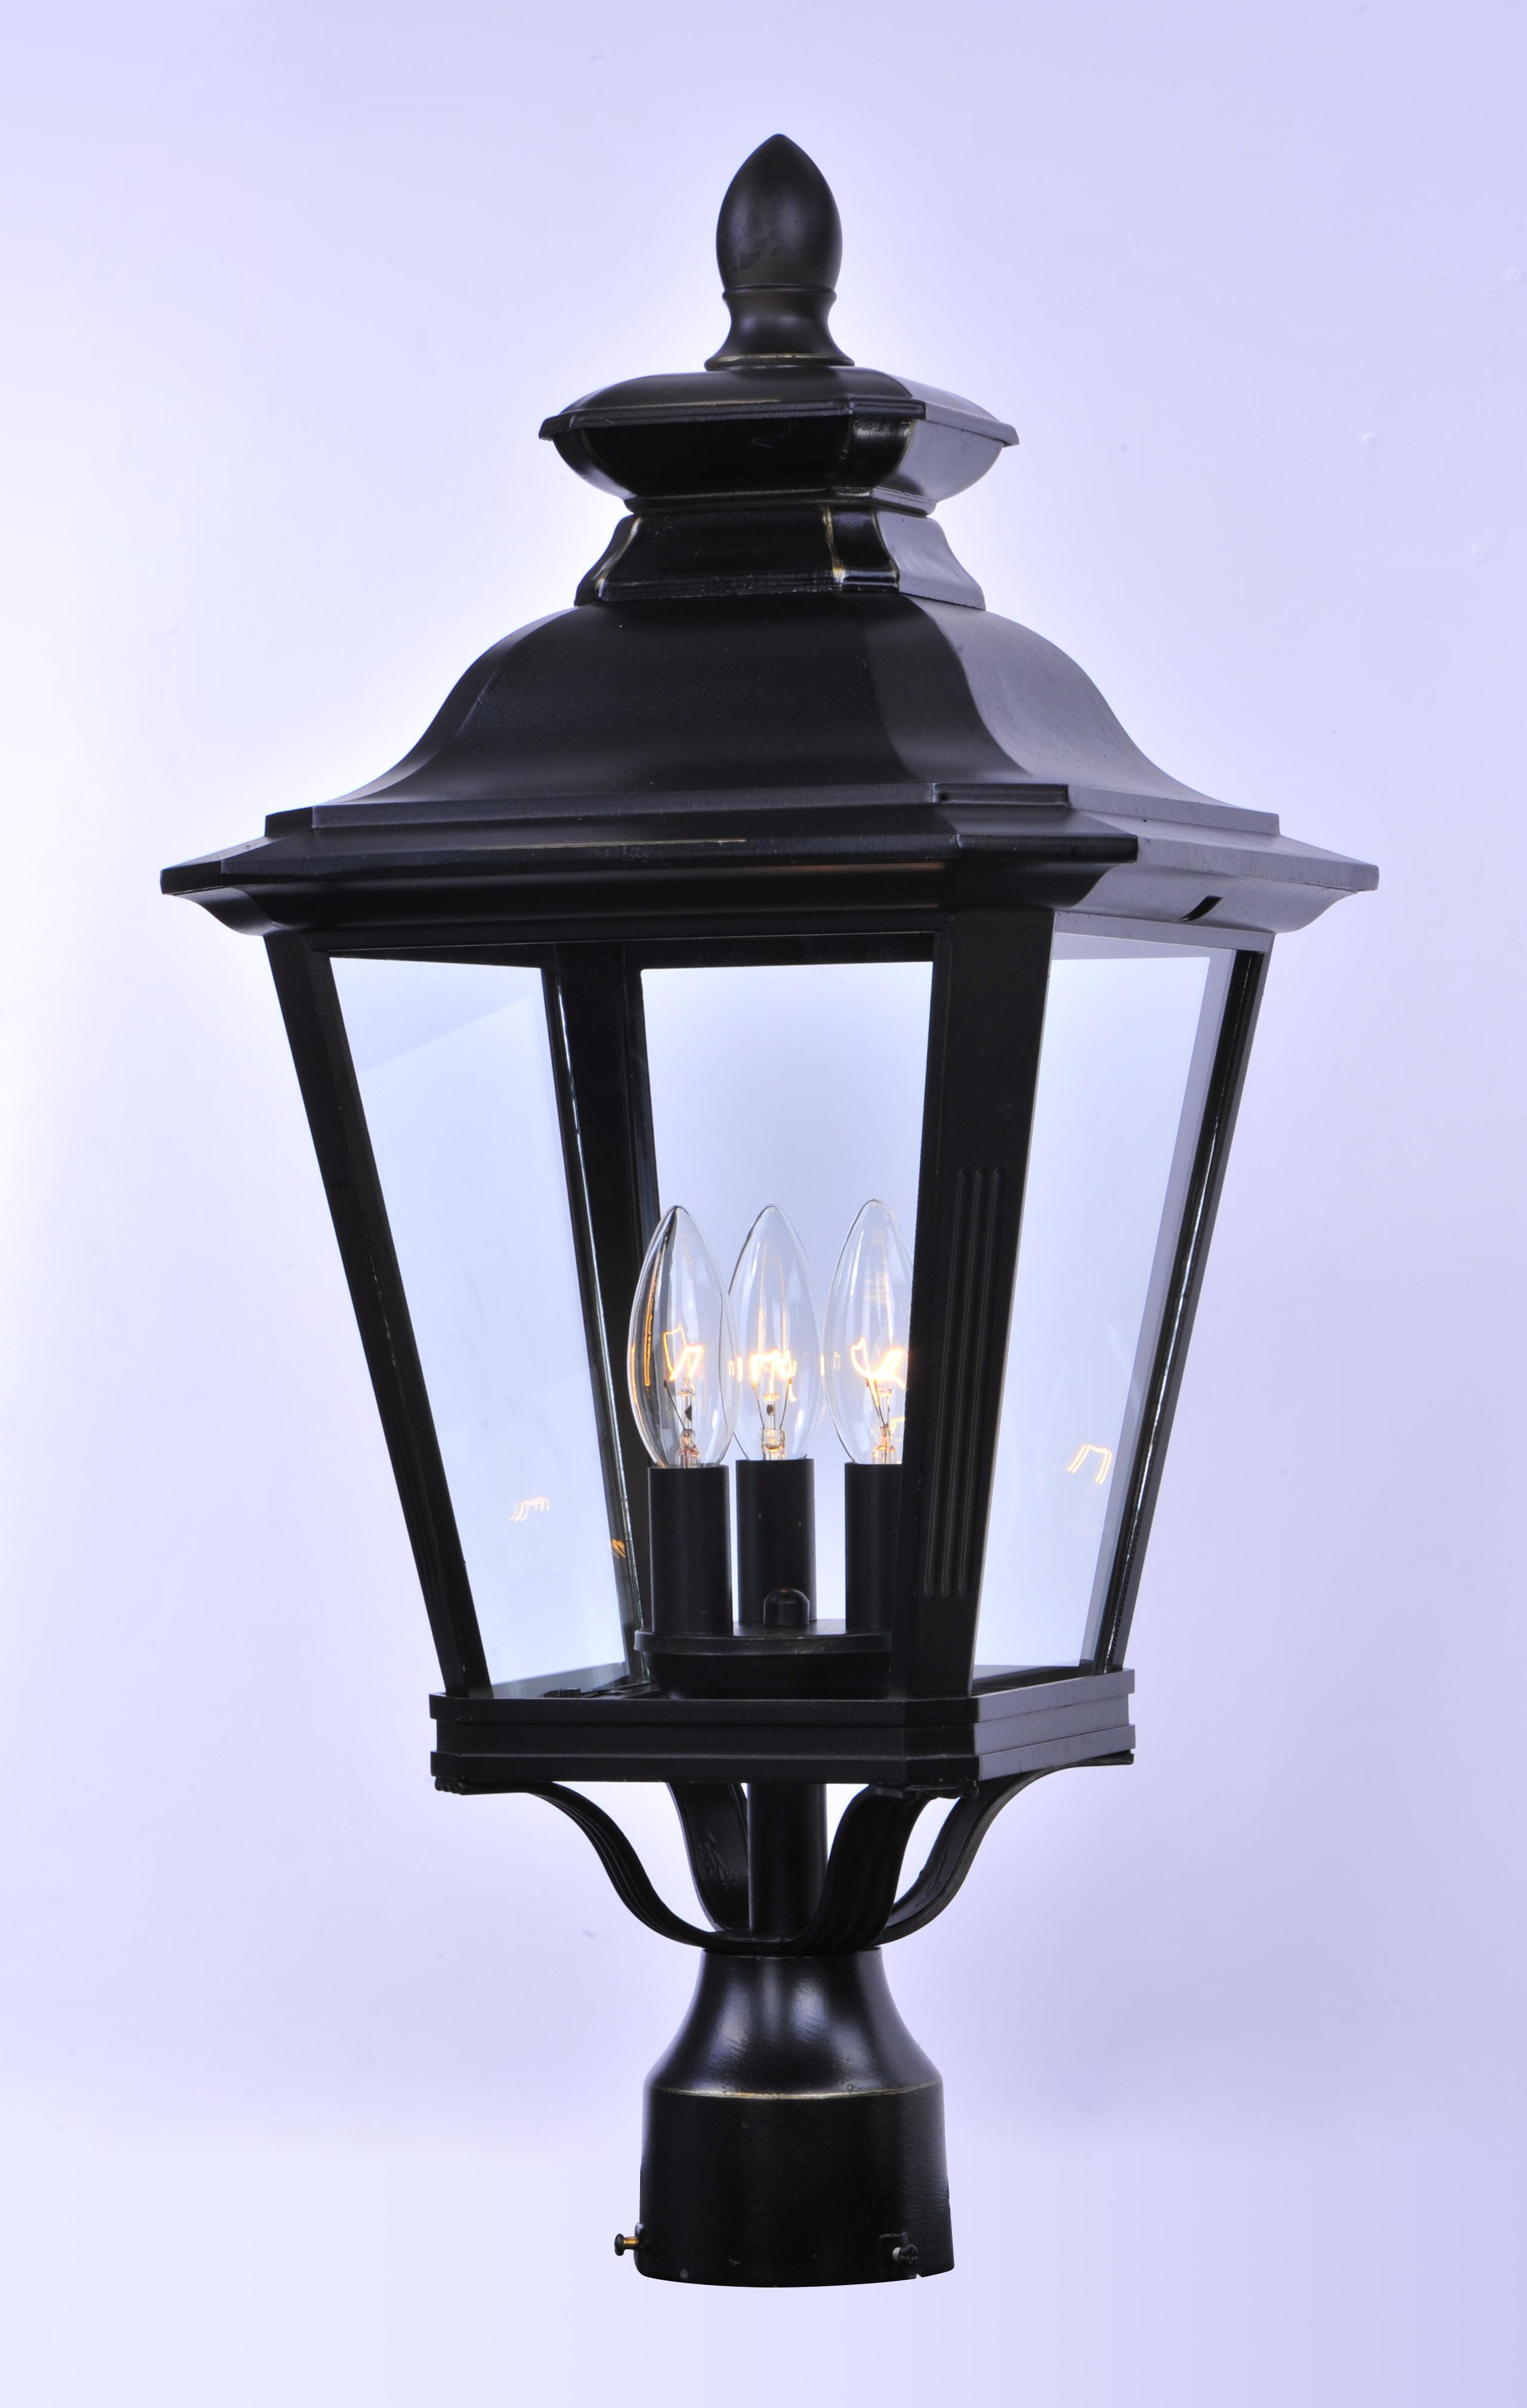 Knoxville 3 Light Outdoor Post Outdoor Maxim Lighting